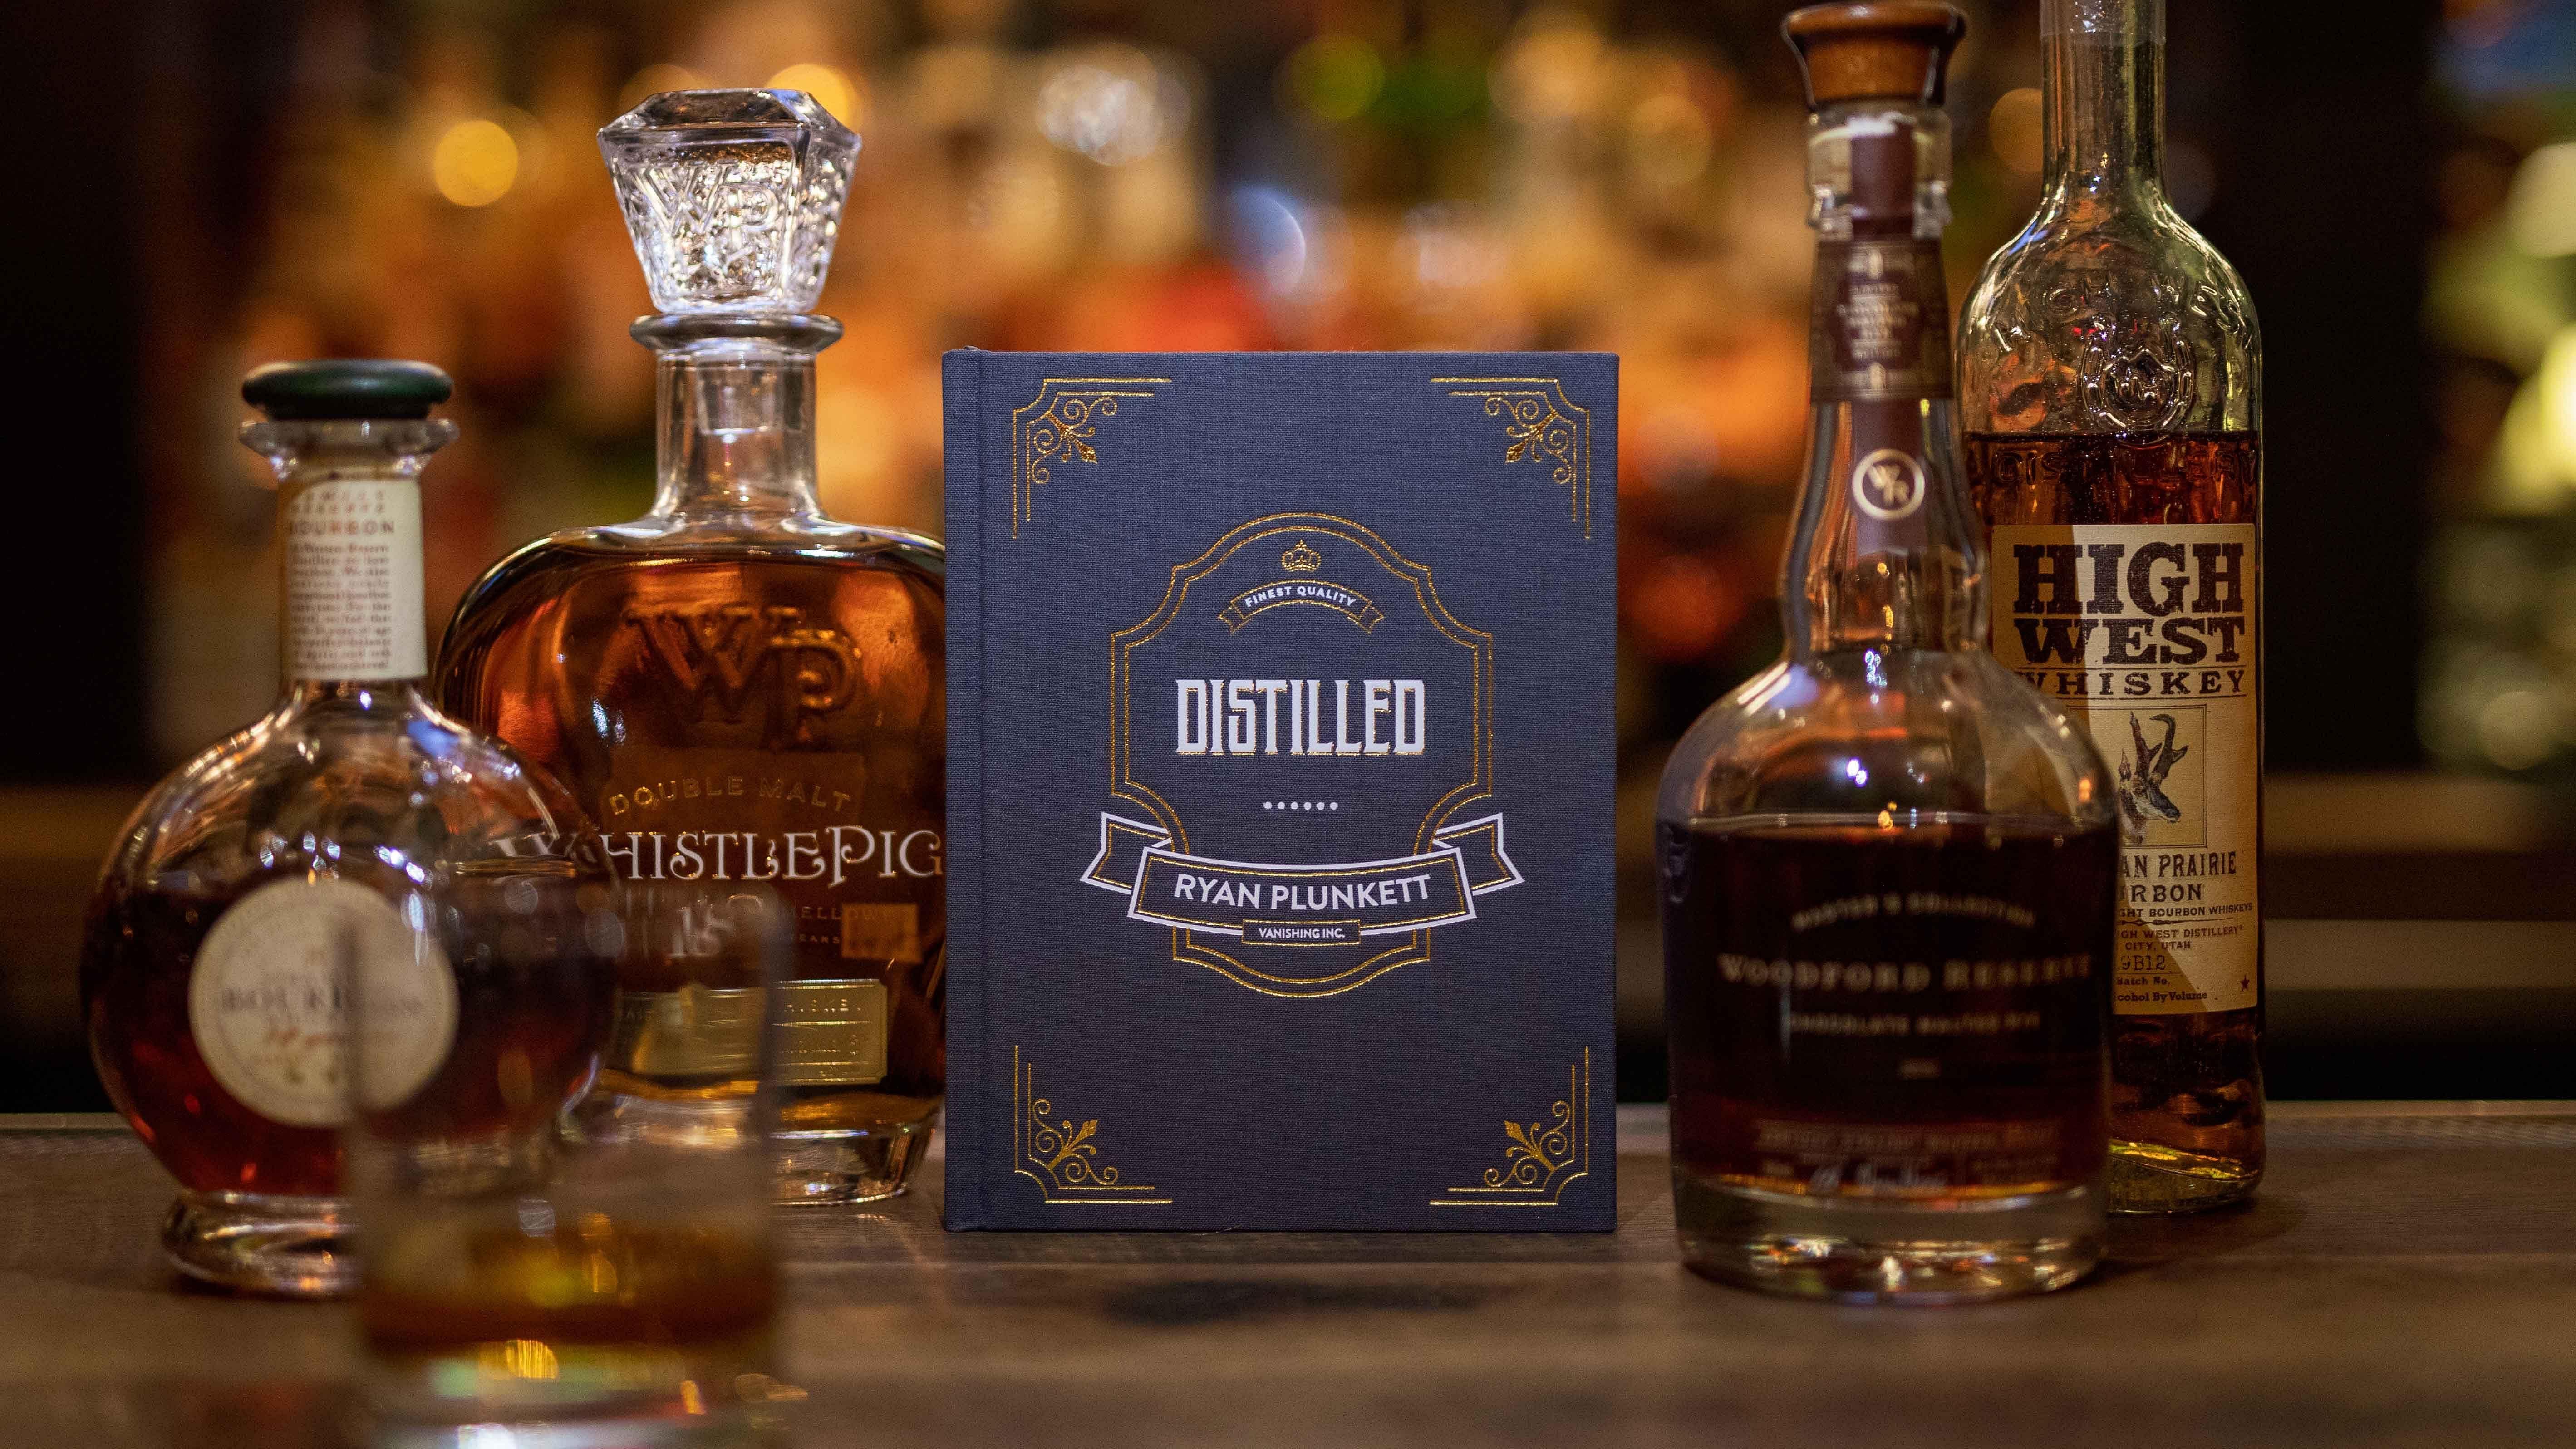 Magician Ryan Plunkett's book Distilled rests on a variety of liquor bottles